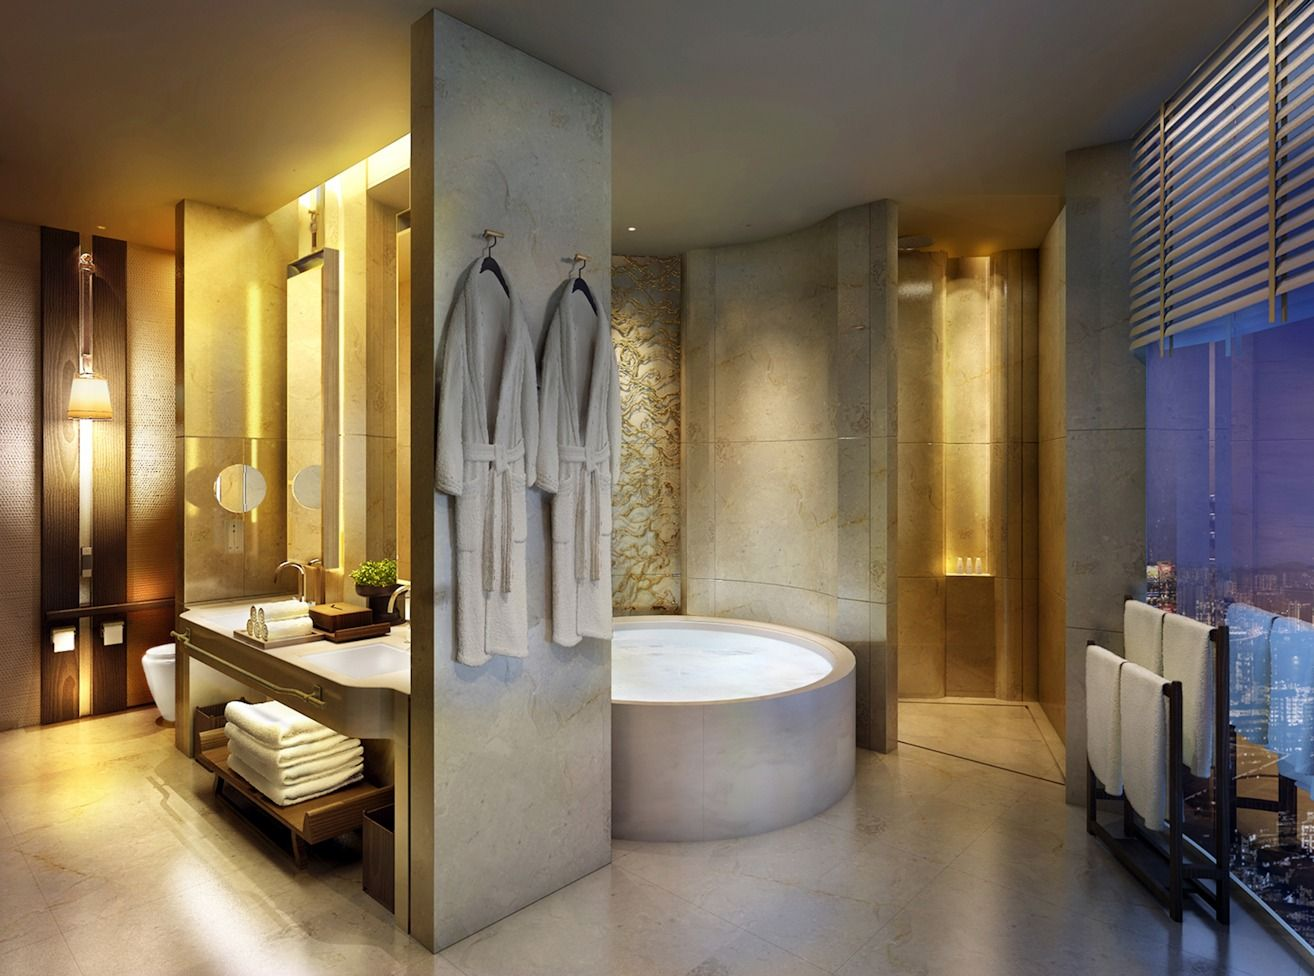 5 Reasons Why The New Waldorf Astoria Bangkok Looks Set To Dazzle Singapore Tatler